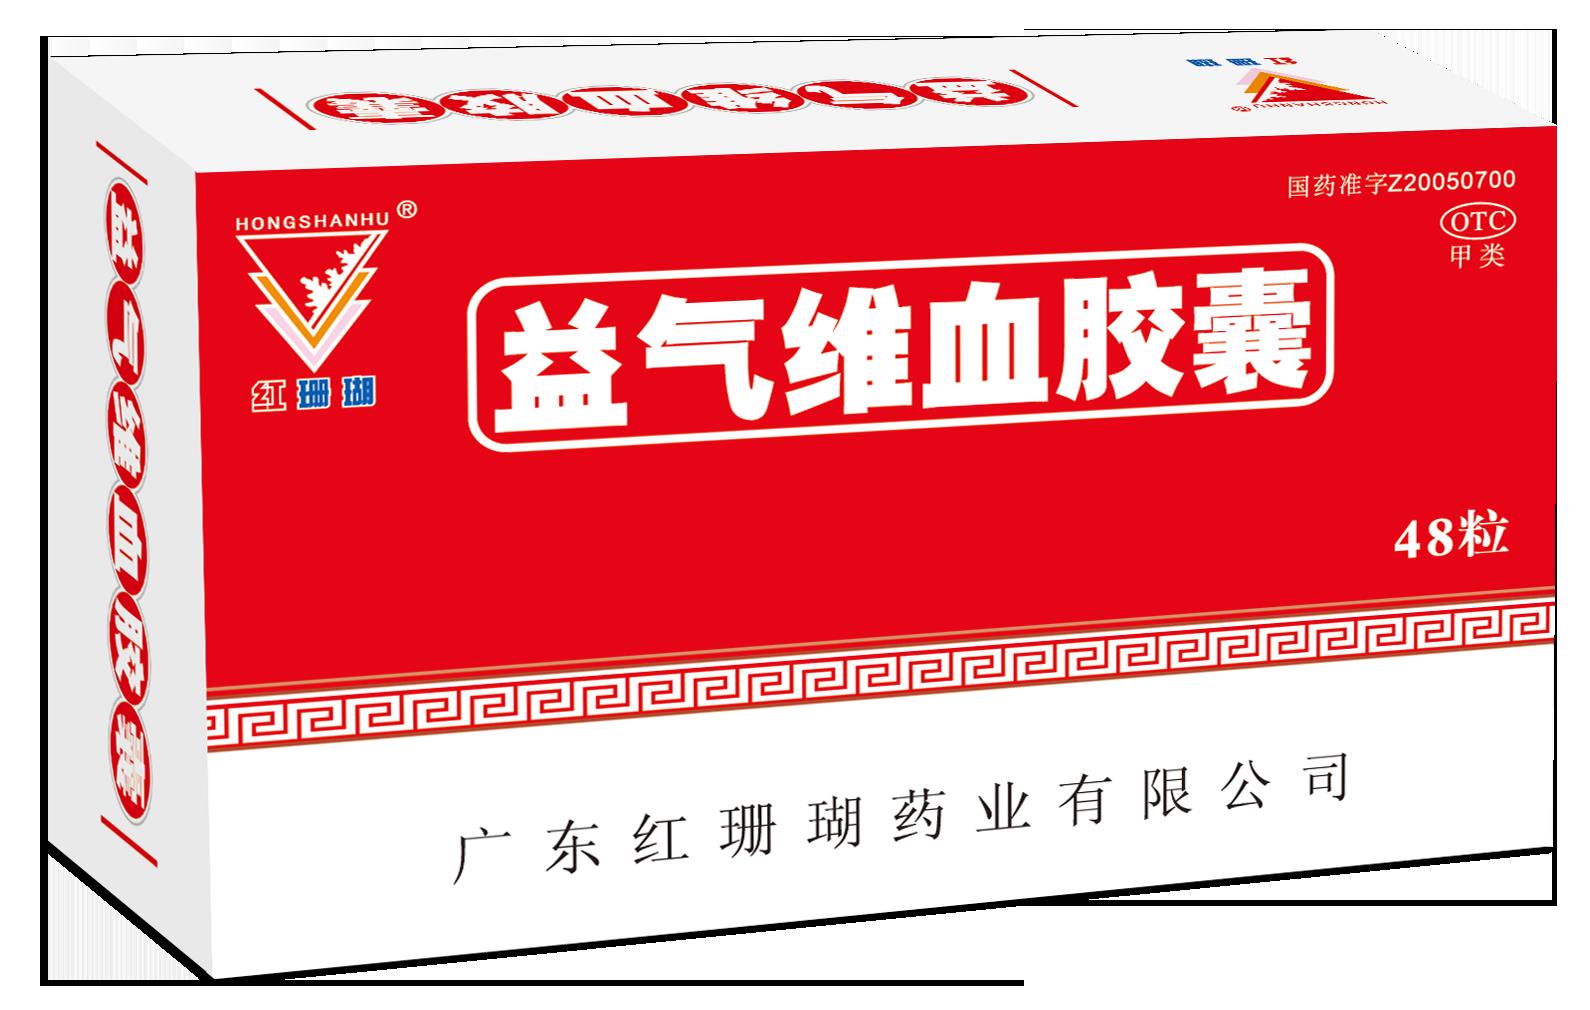 new贝博ballbet体育维血48粒 包装盒.png